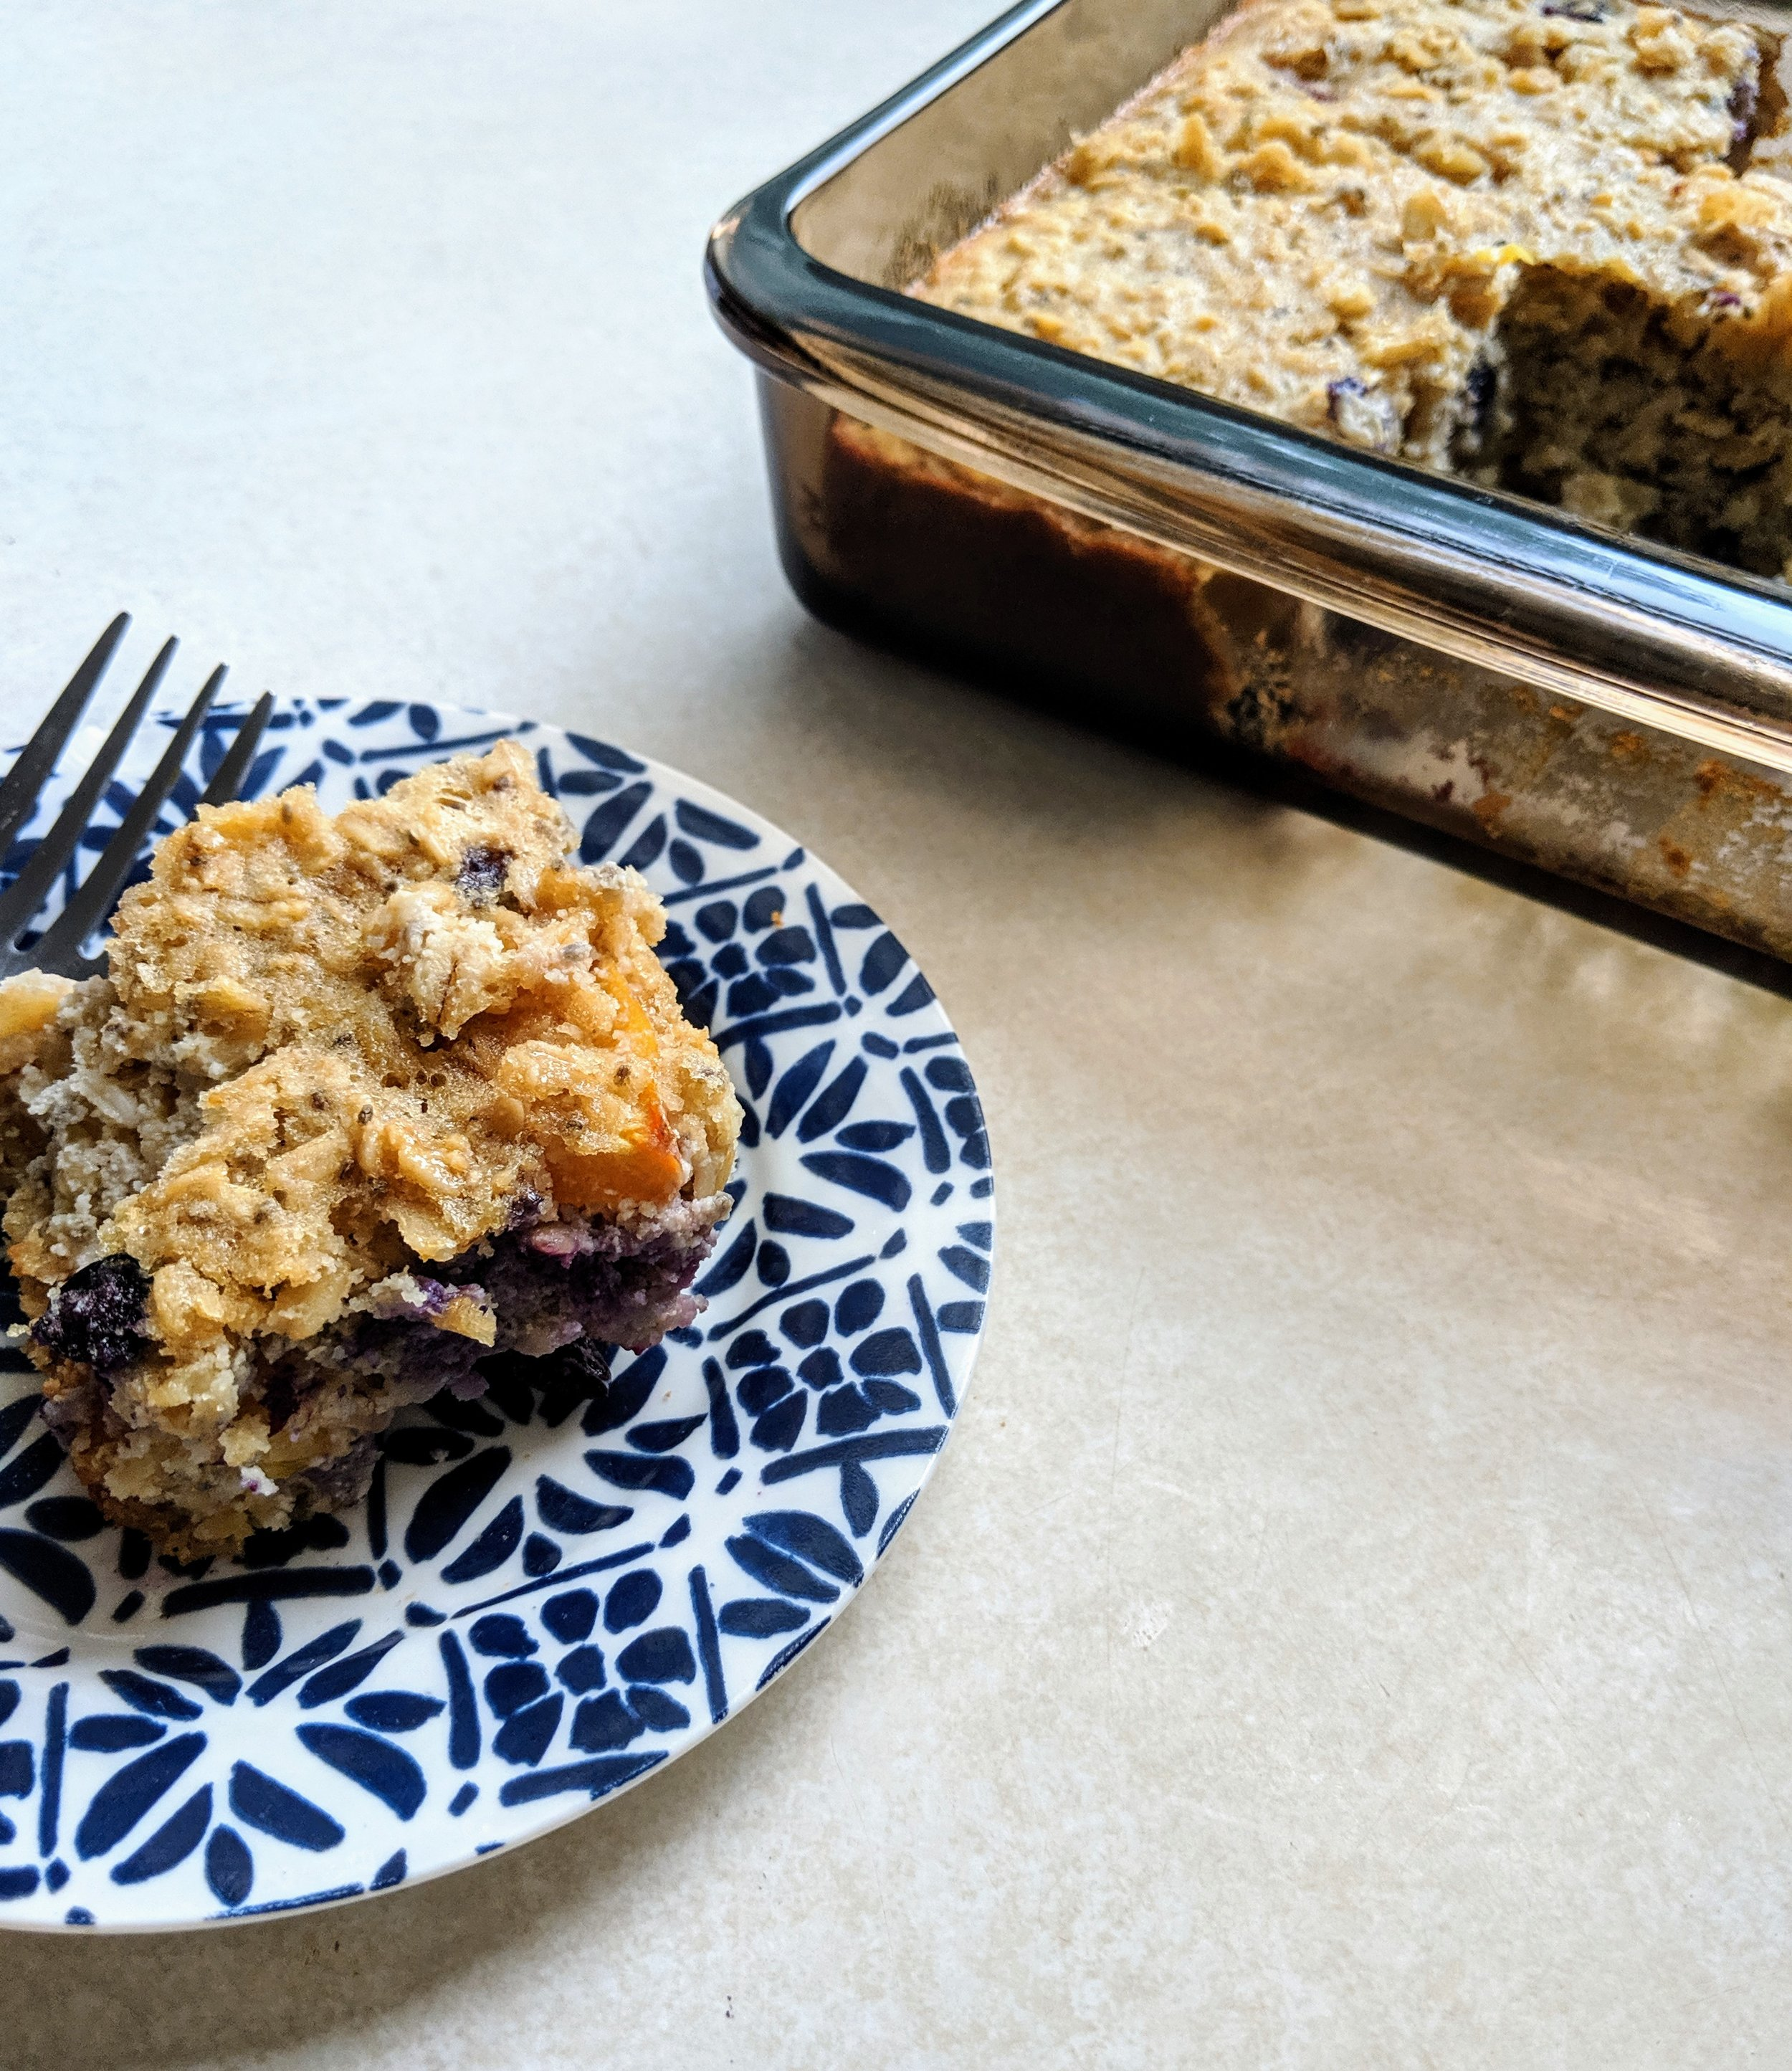 Baked Oatmeal, Lake Superior Kitchen, gluten free, dairy free, healthy recipe